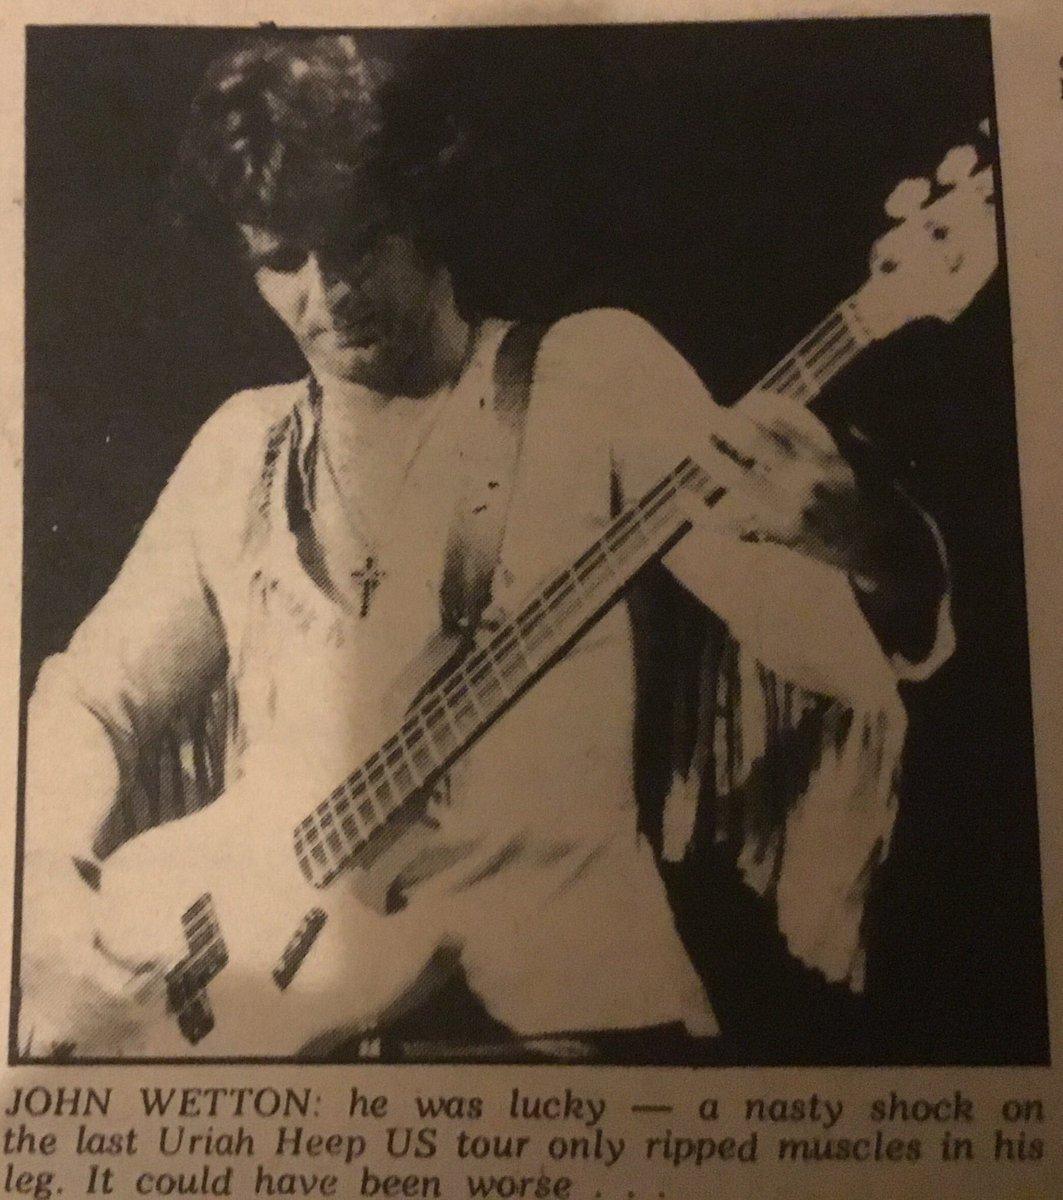 ELECTRIC SHOCKS  KEITH RALF YARDBIRD DIES :(  JOHN WETTON INJURED :( ARTICLE EXAMINÉS WHY ? @theyardbirds @DGMHQ #johnwetton #keithrelf @ledzepnews @ledzeplogpic.twitter.com/jqQ5RVjM1j